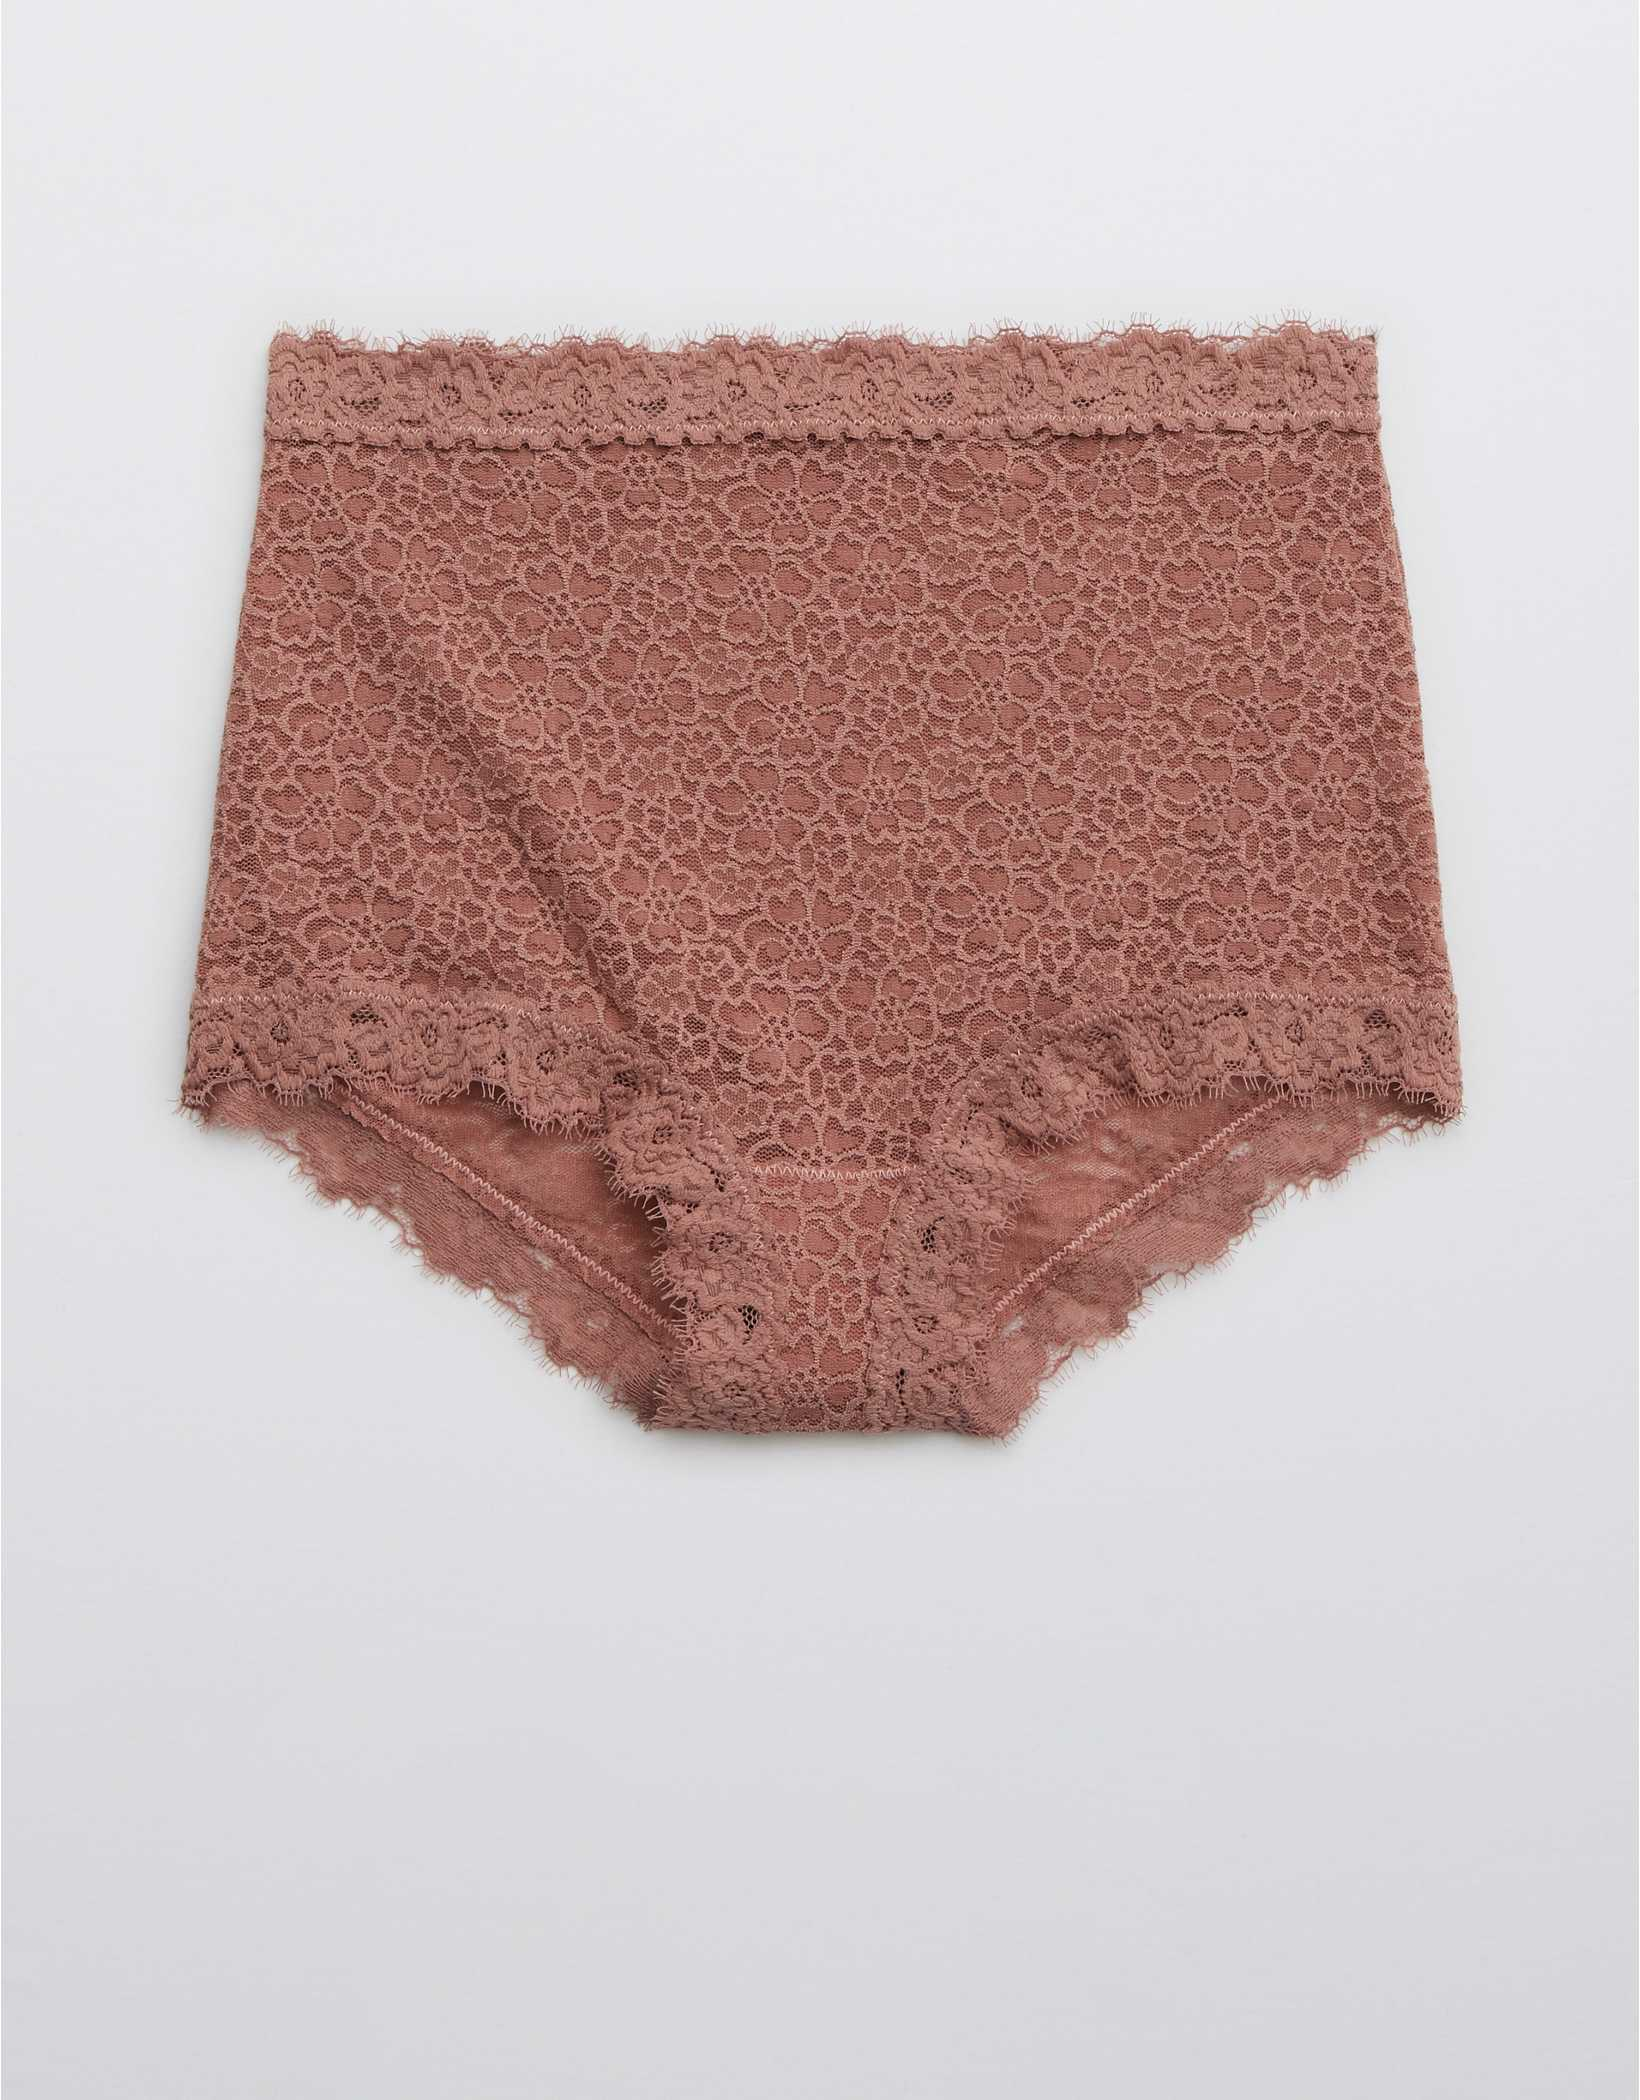 Aerie Eyelash Lace High Waisted Boybrief Underwear